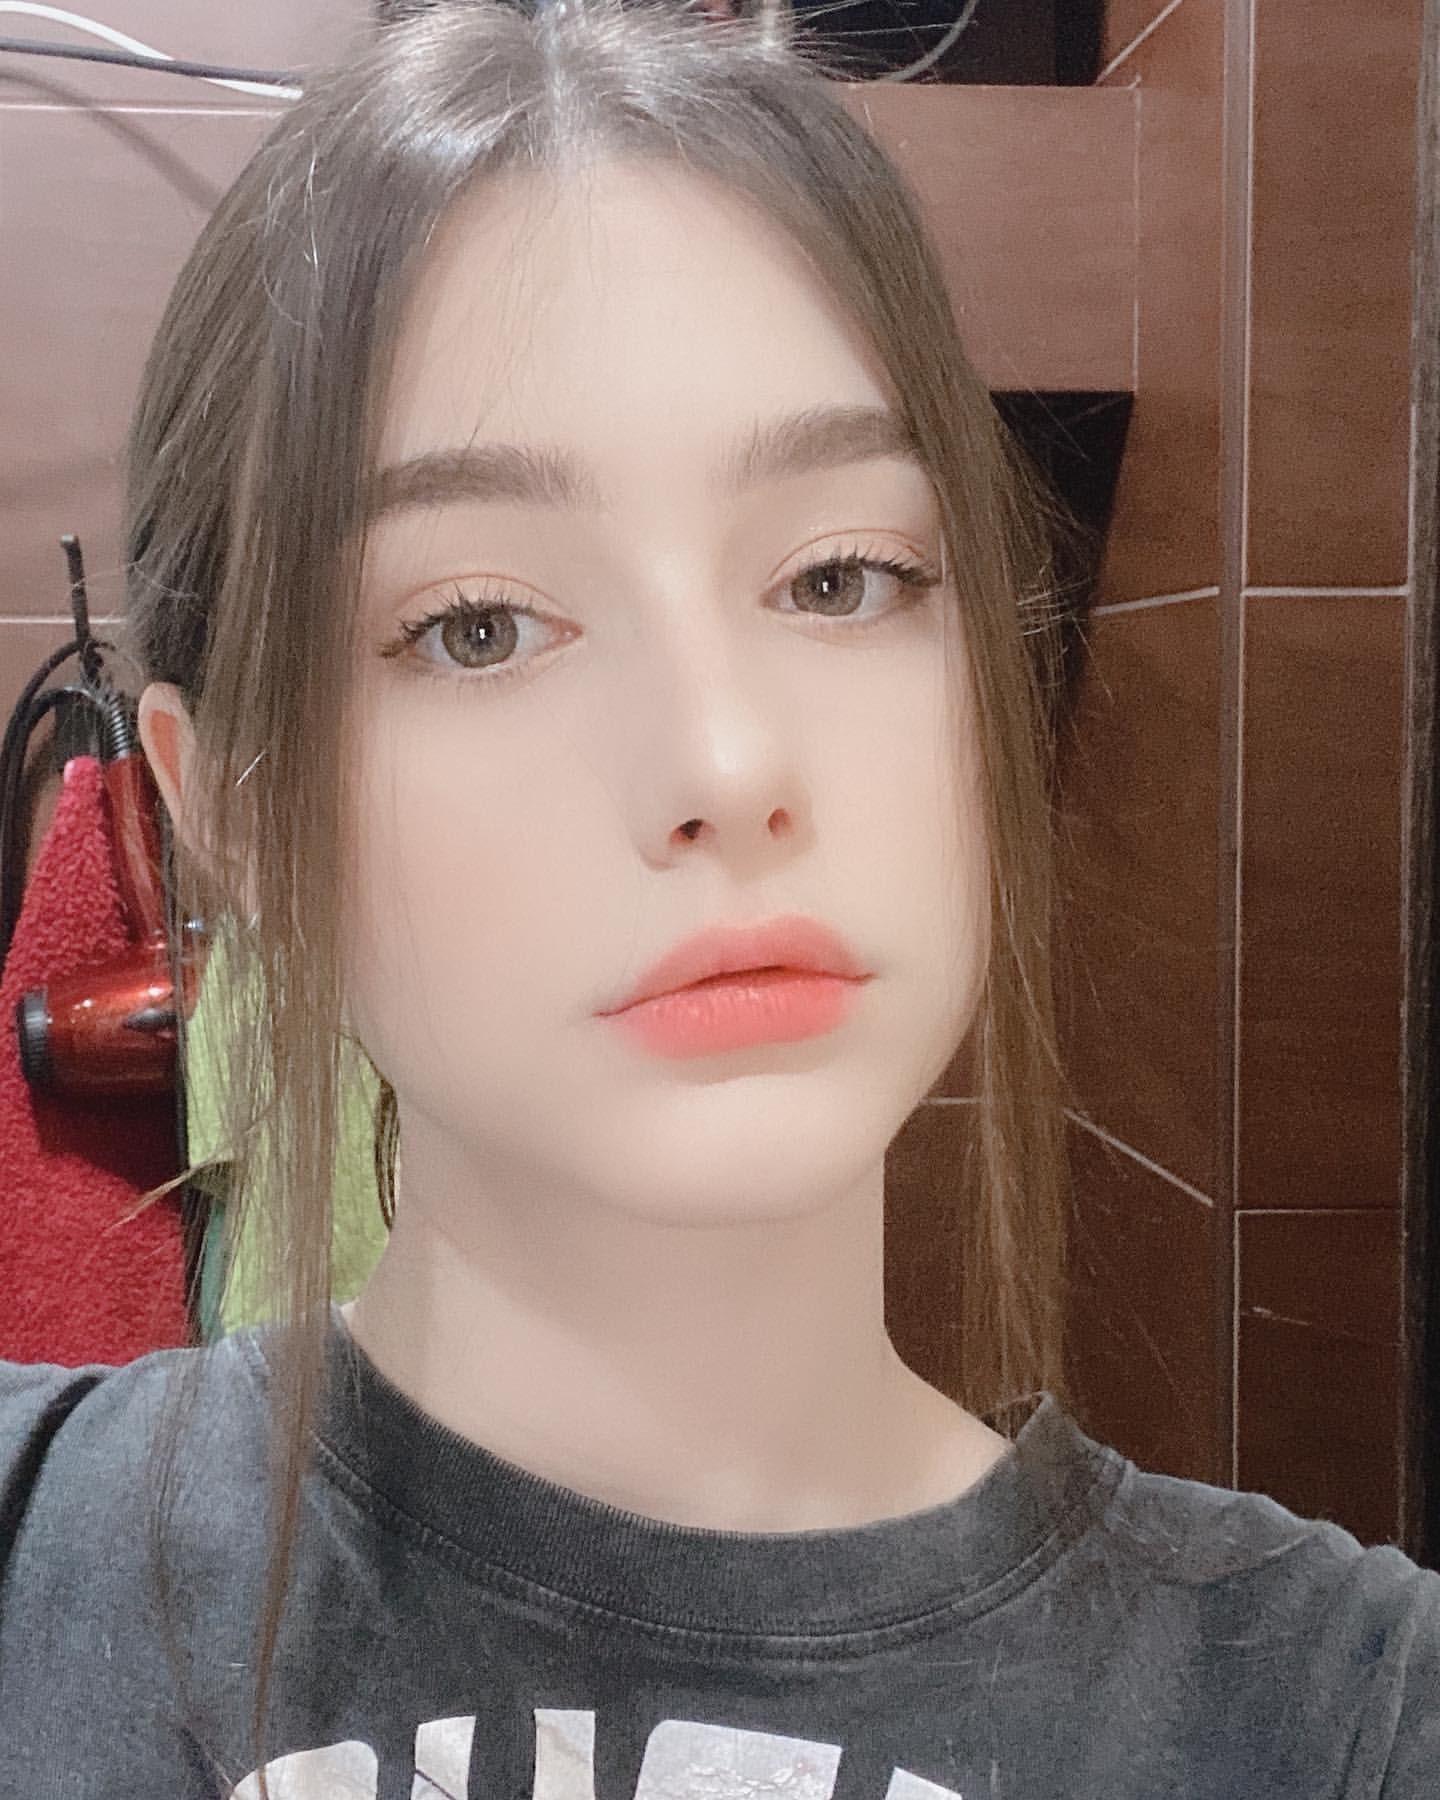 Tarankaaa In 2020 Cute Beauty Beauty Girl Cute Girl Poses